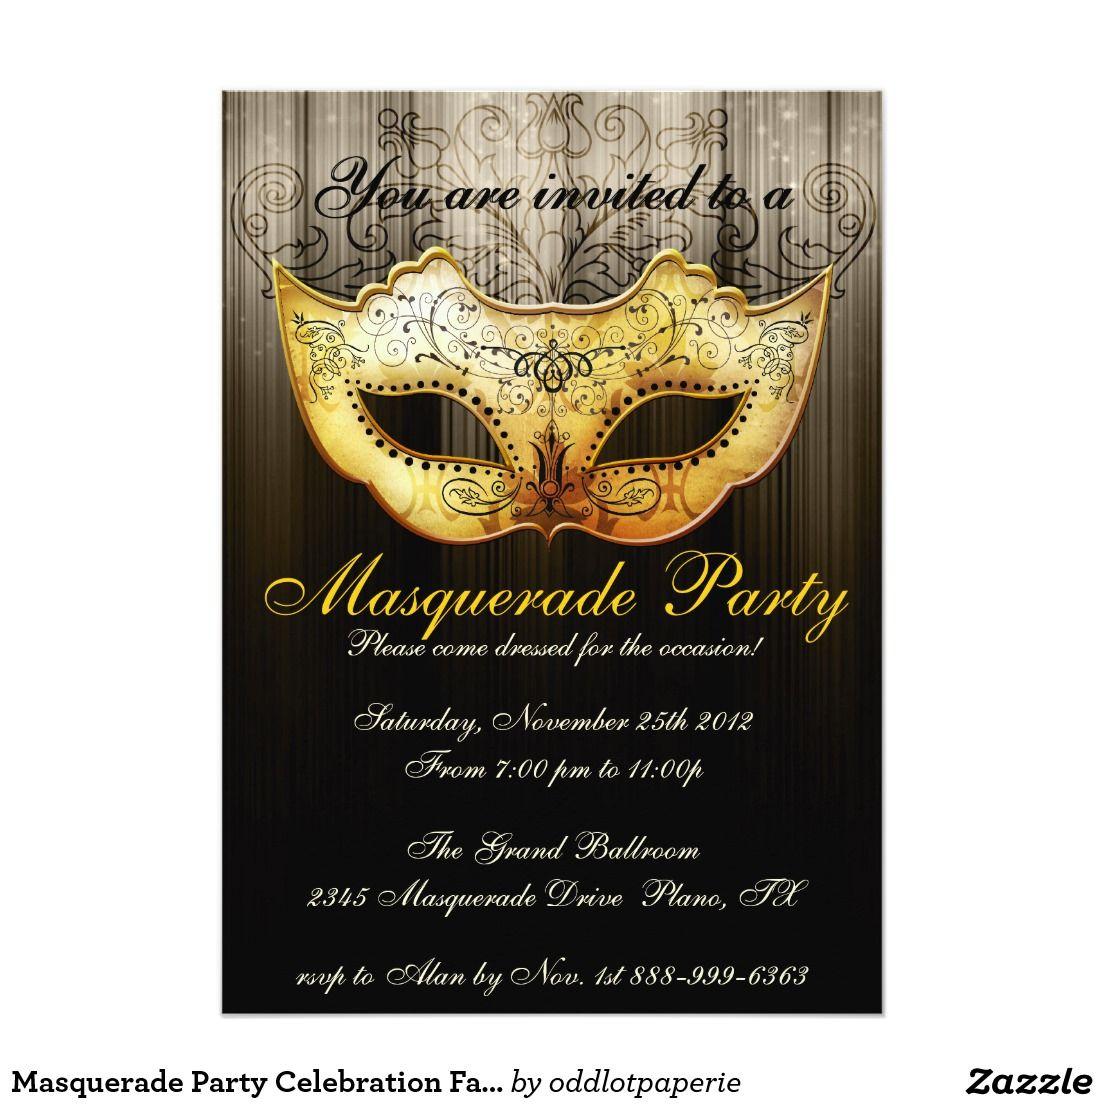 Masquerade Party Celebration Fancy Gold Invitation ...